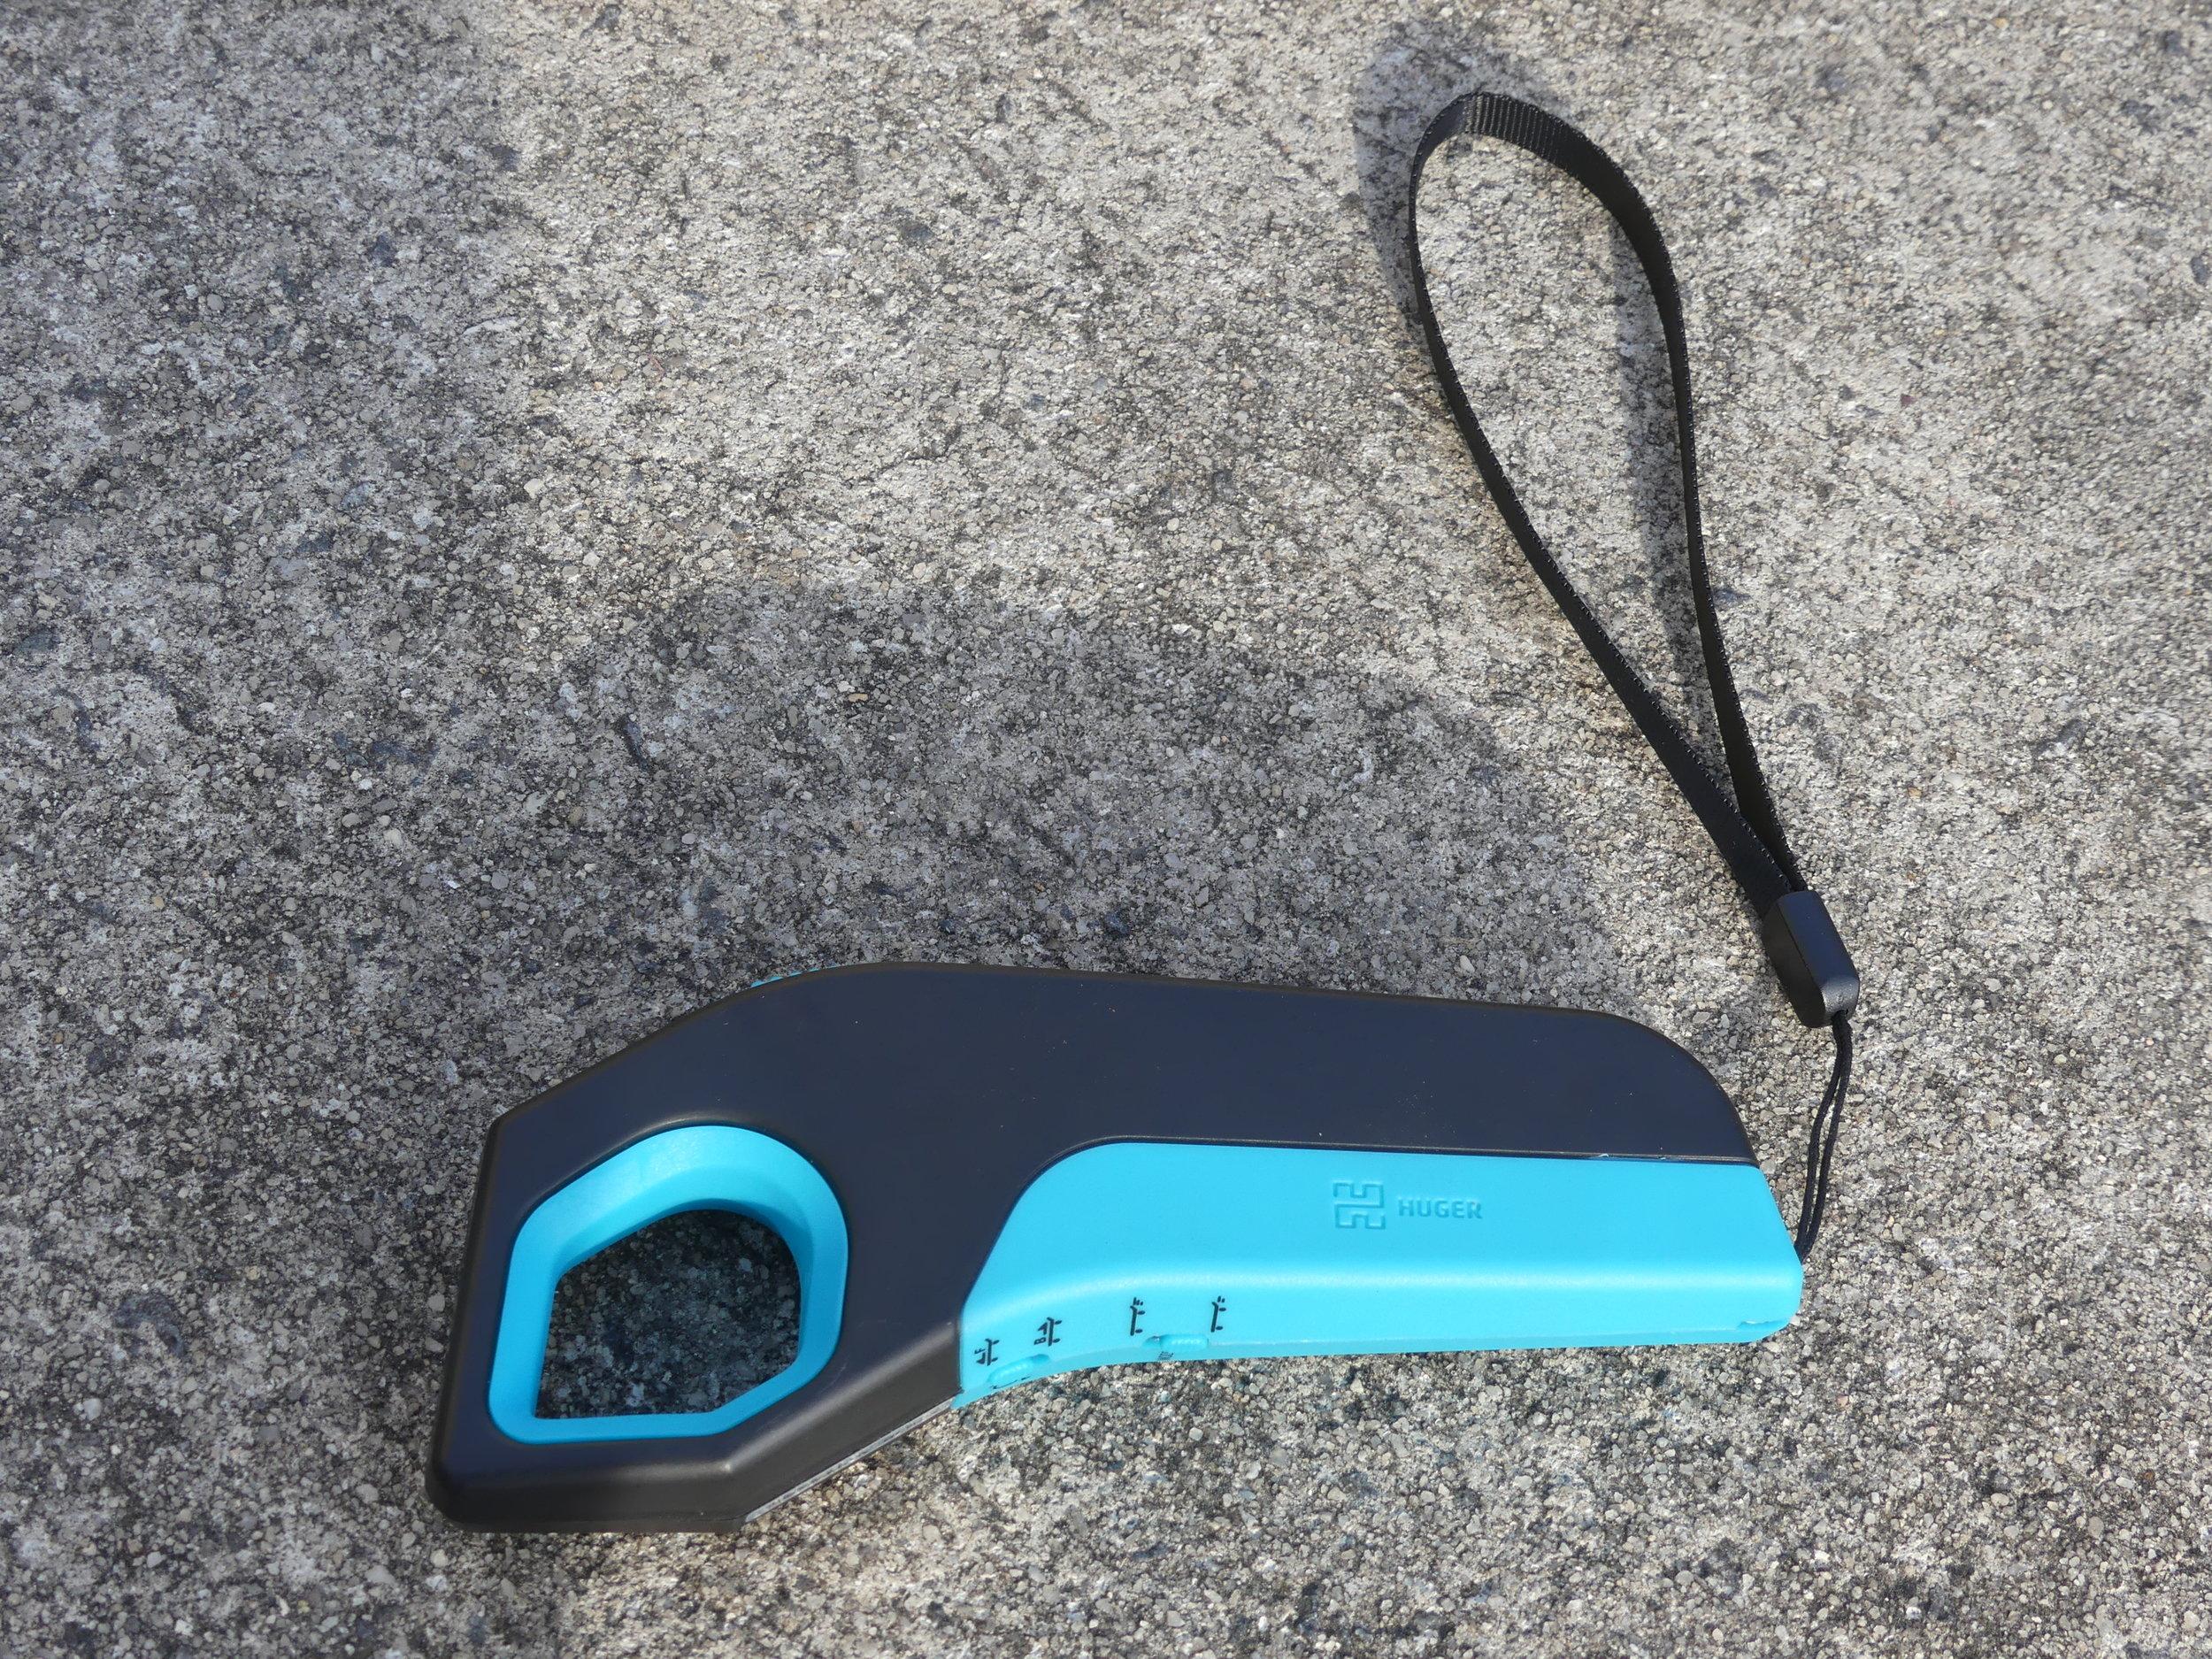 Huger Tech Remote